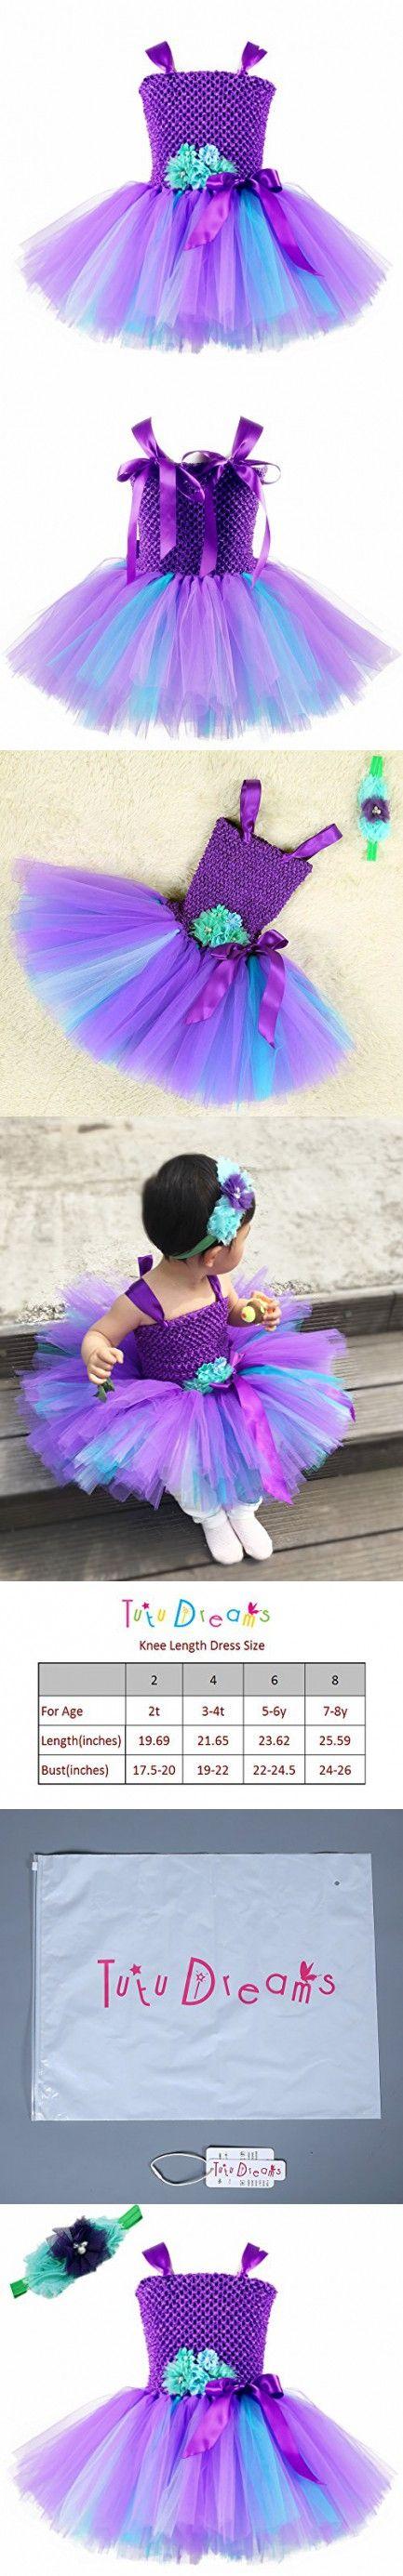 Tutu Dreams Baby Girl Tutu Dresses Mermaid Dress Up (S, Purple-teal)